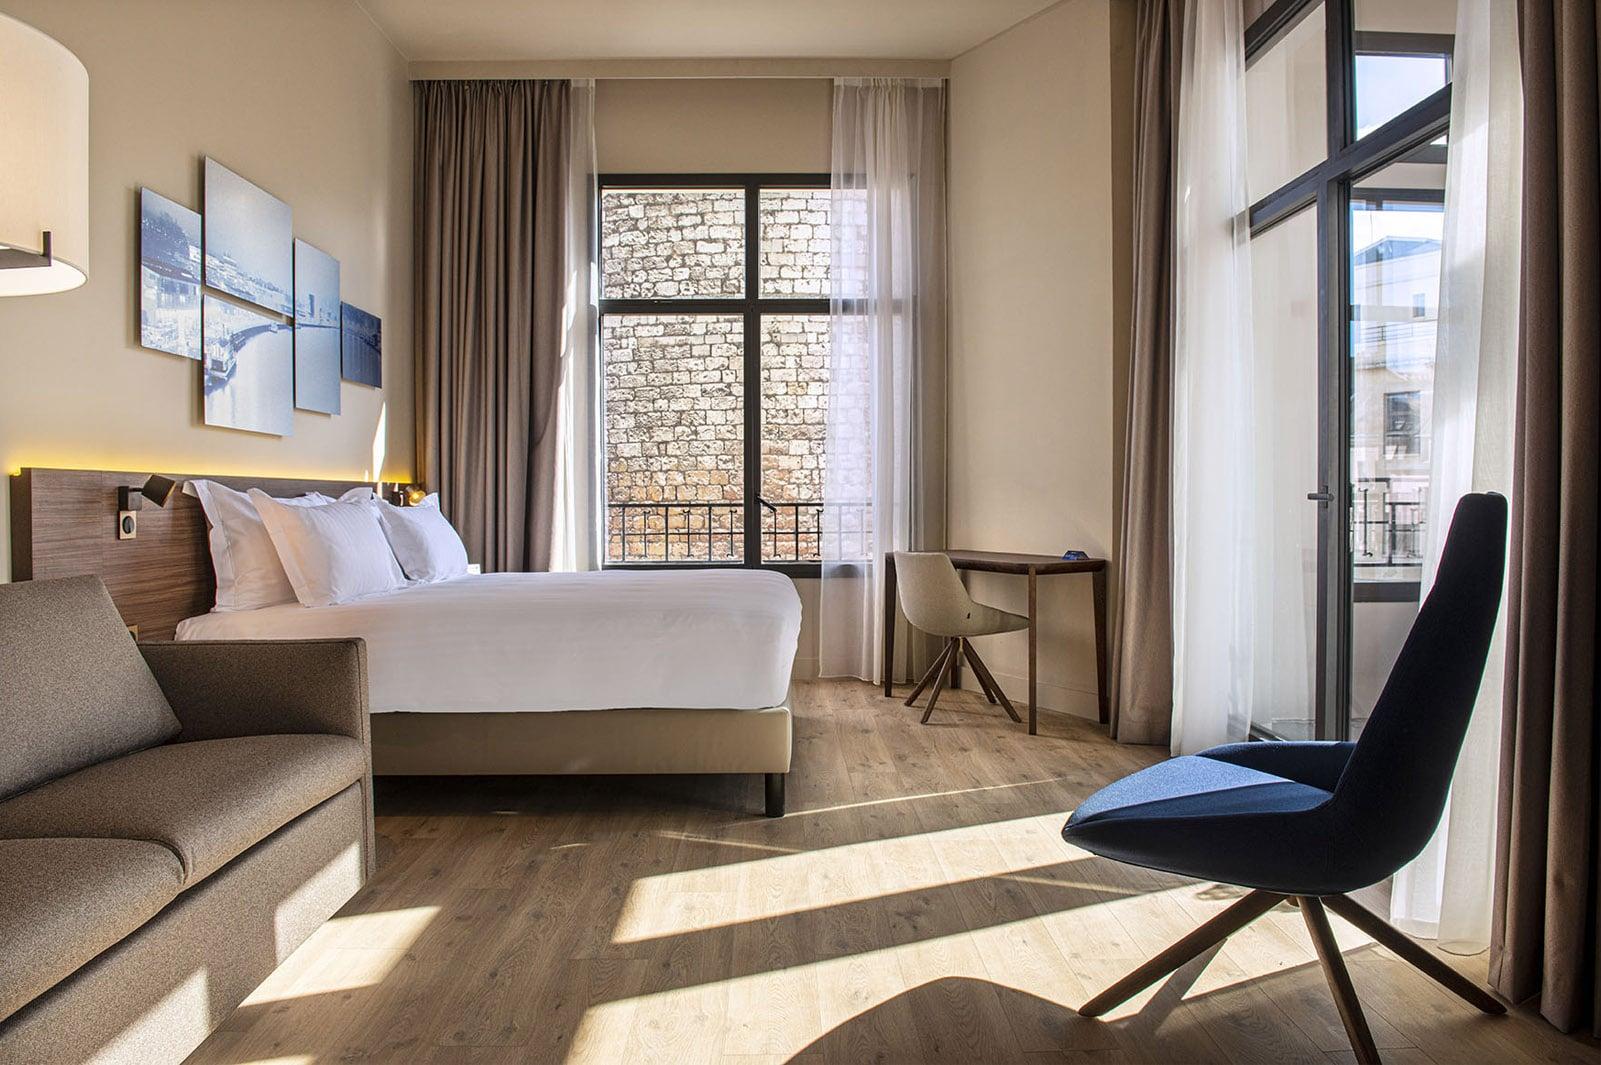 hotel-du-donjon-cba-rouen-francisvauban-4